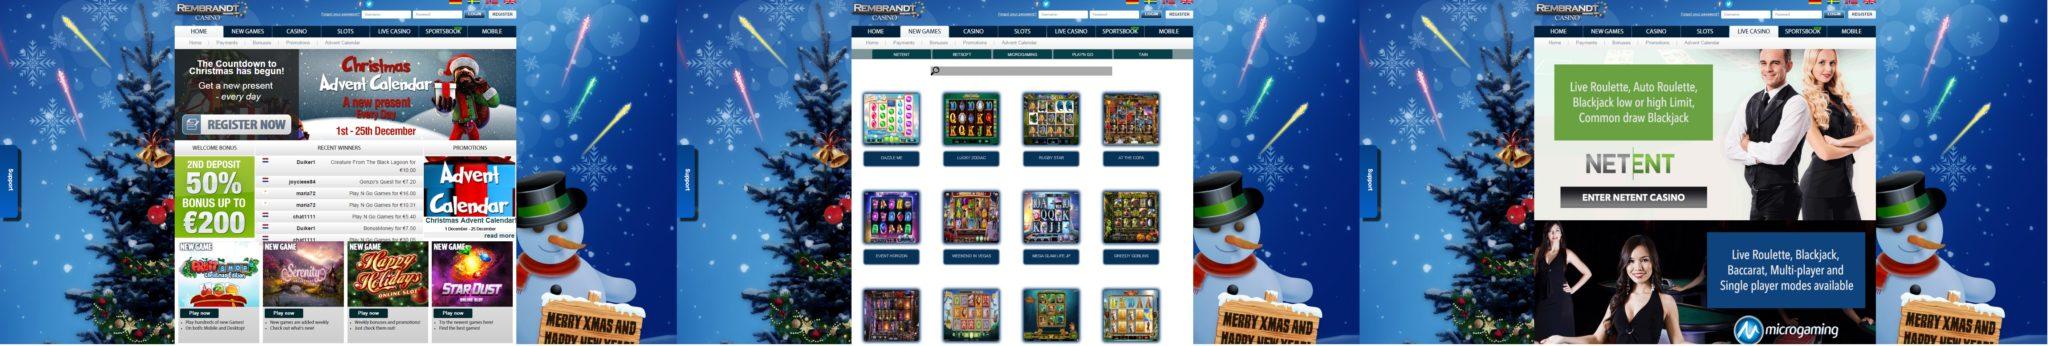 Rembrandt Casino_screens